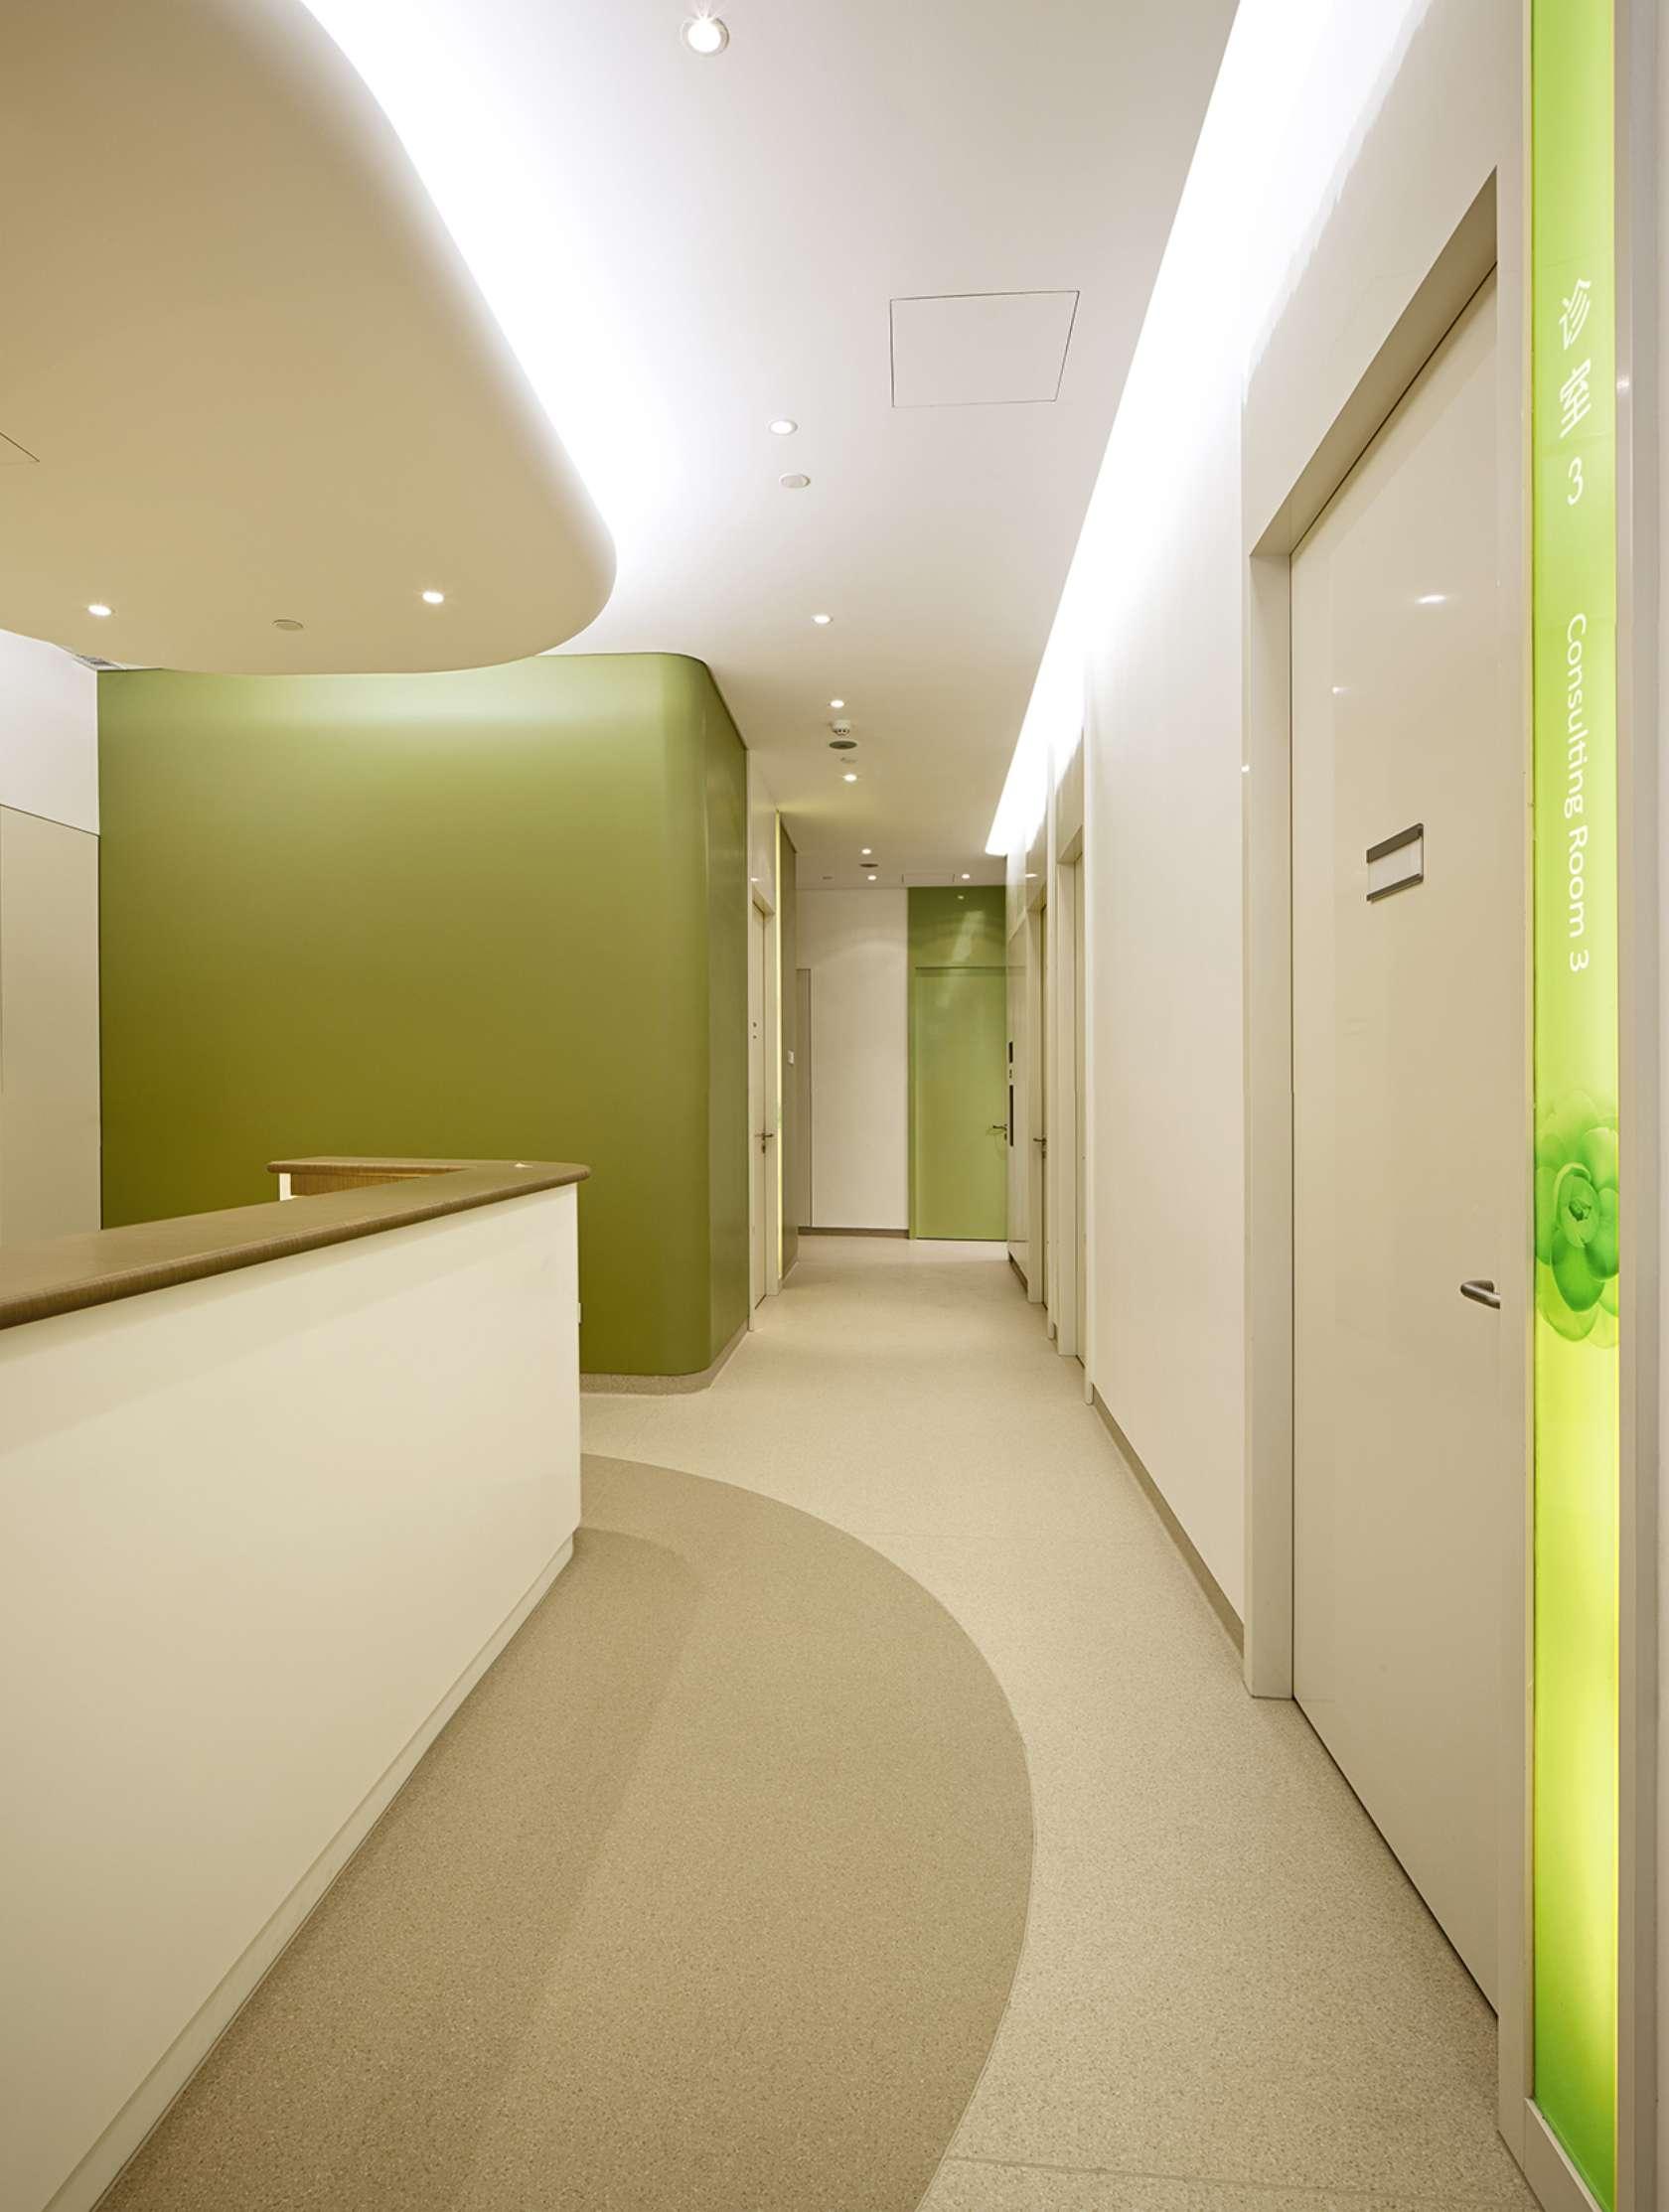 Hospital Room Interior Design